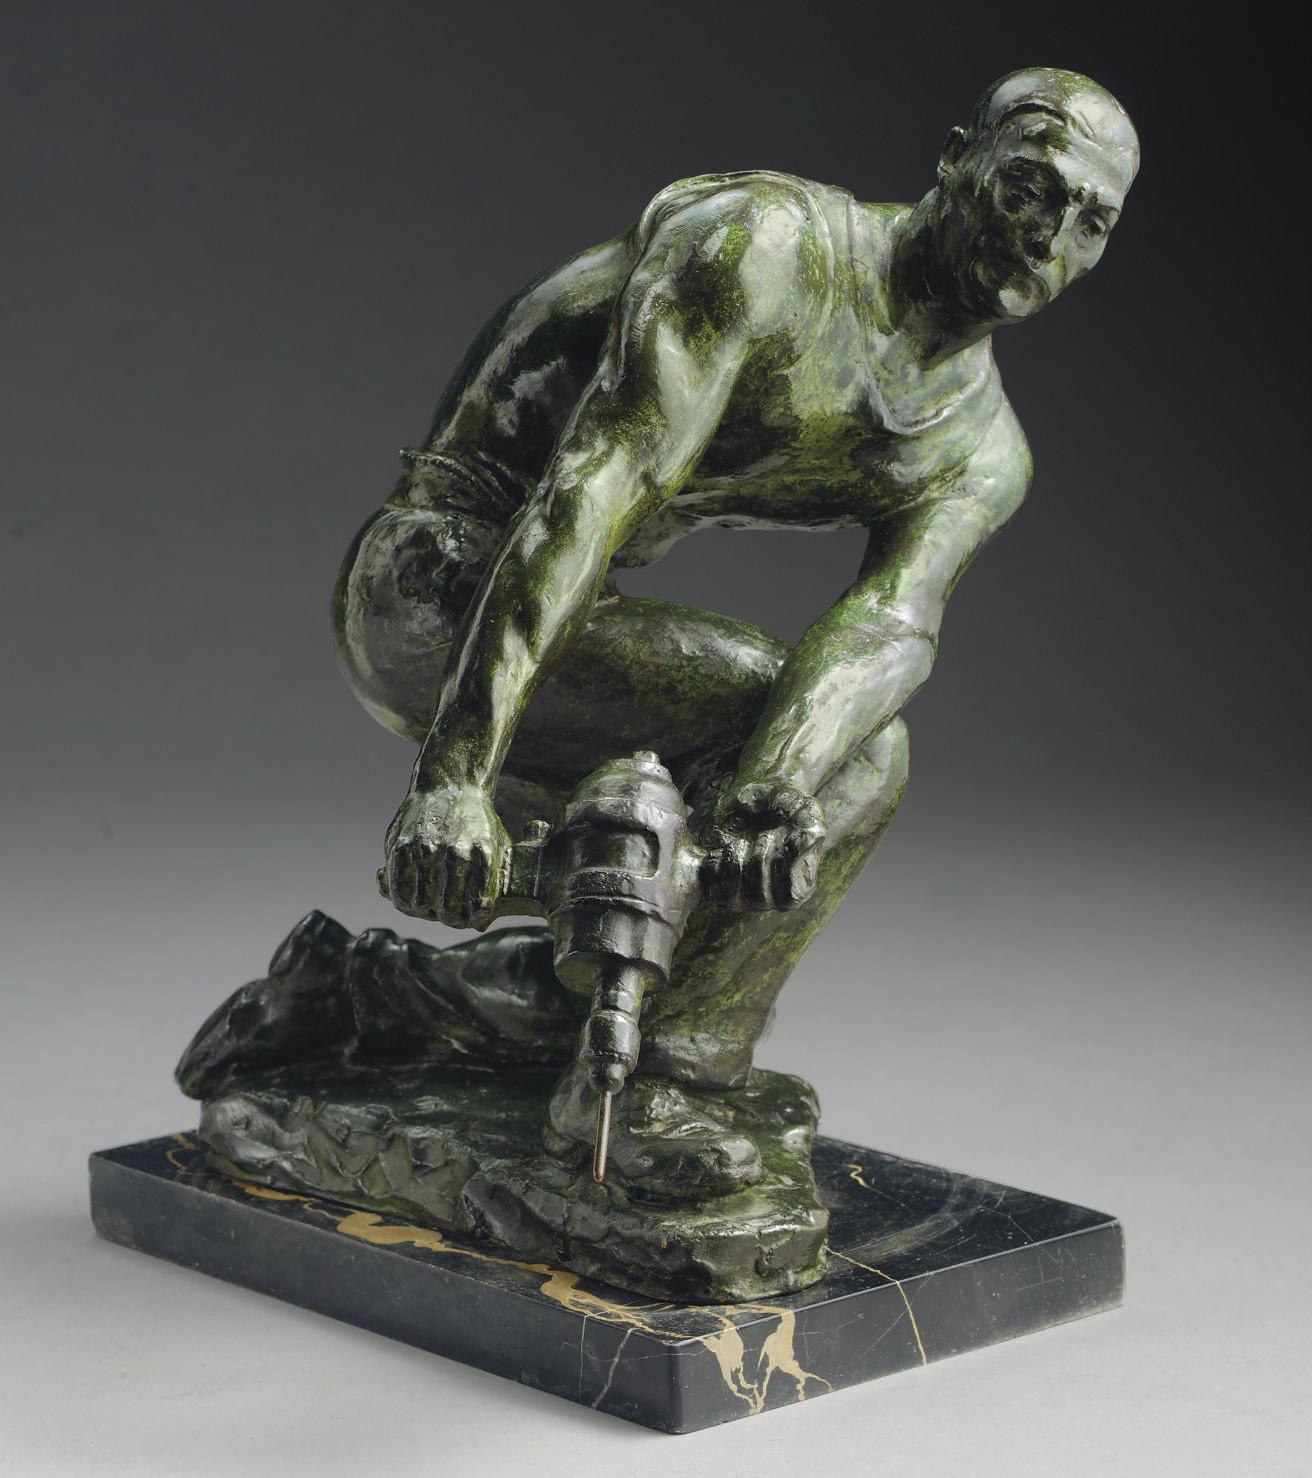 Man with Jackhammer